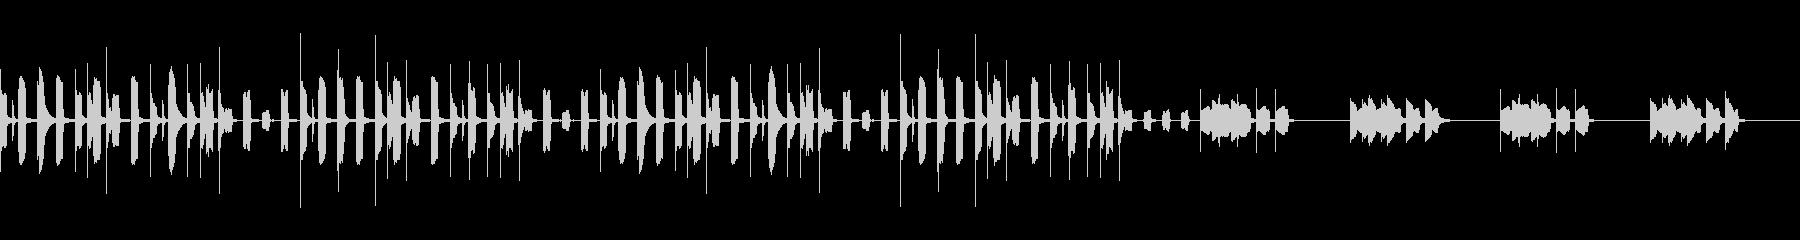 YouTube・料理・ほのぼの・日常系の未再生の波形